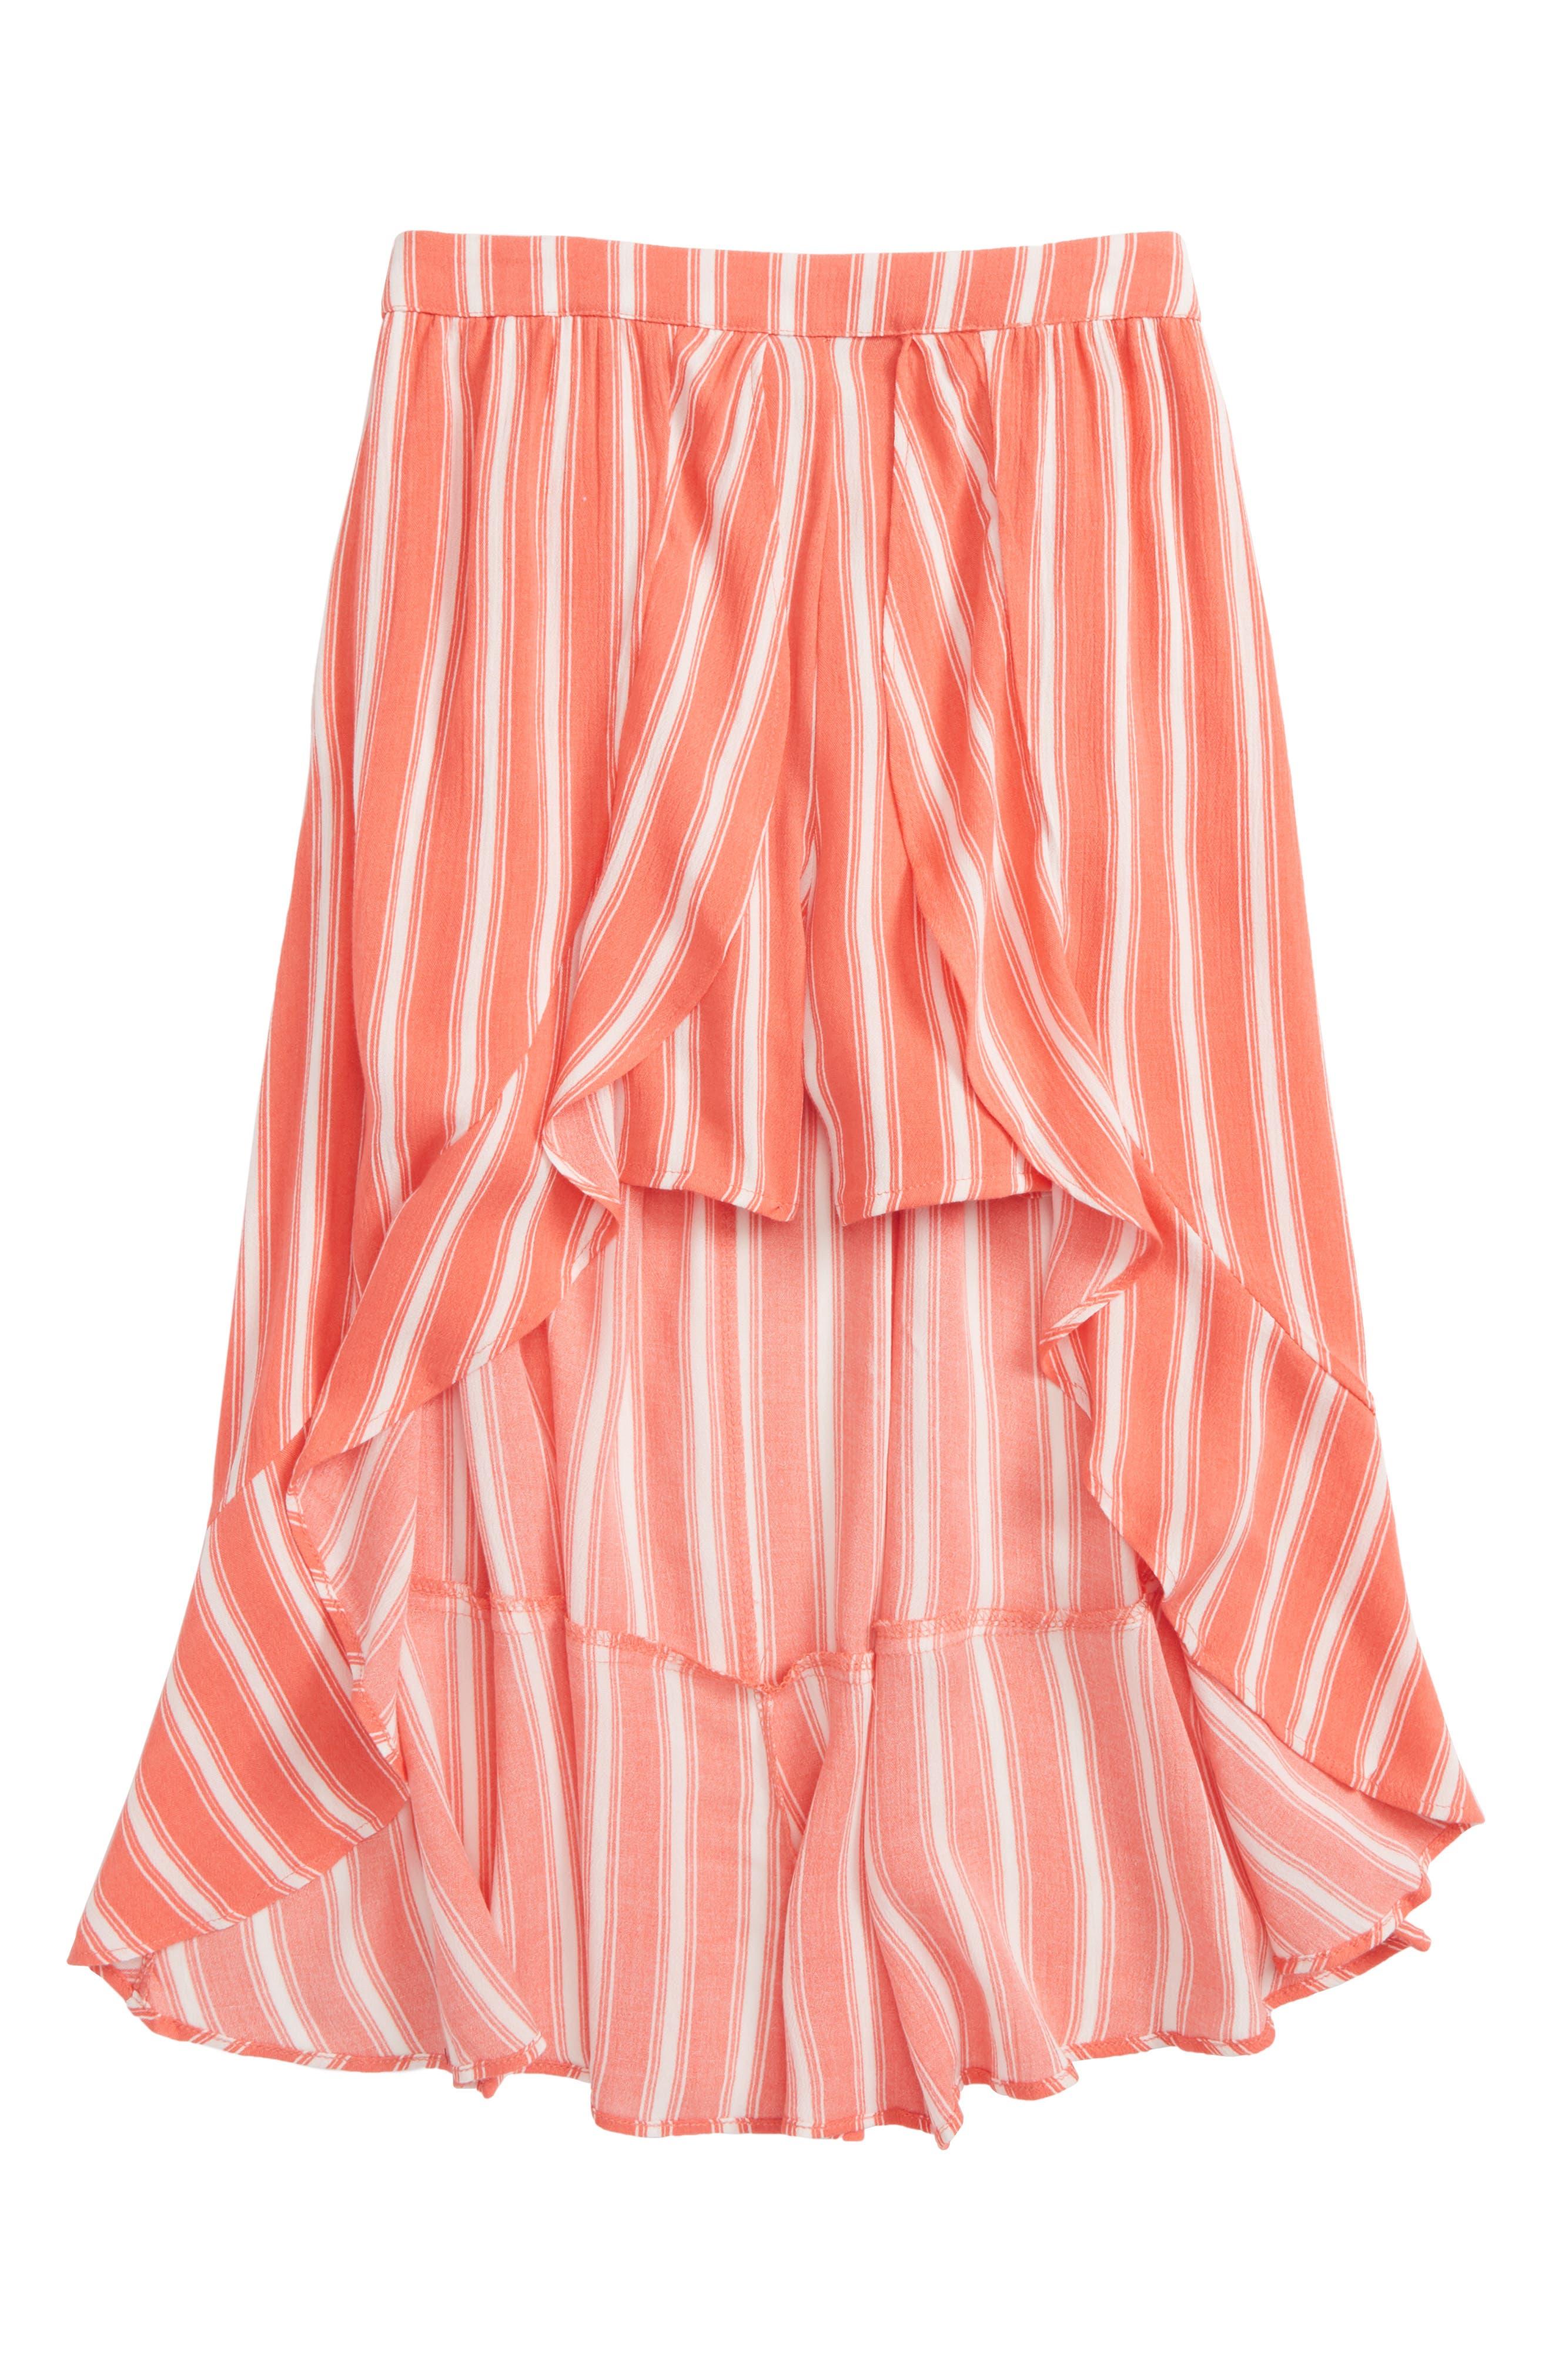 Stripe Walk Through Skirt,                         Main,                         color, Coral/ Ivory